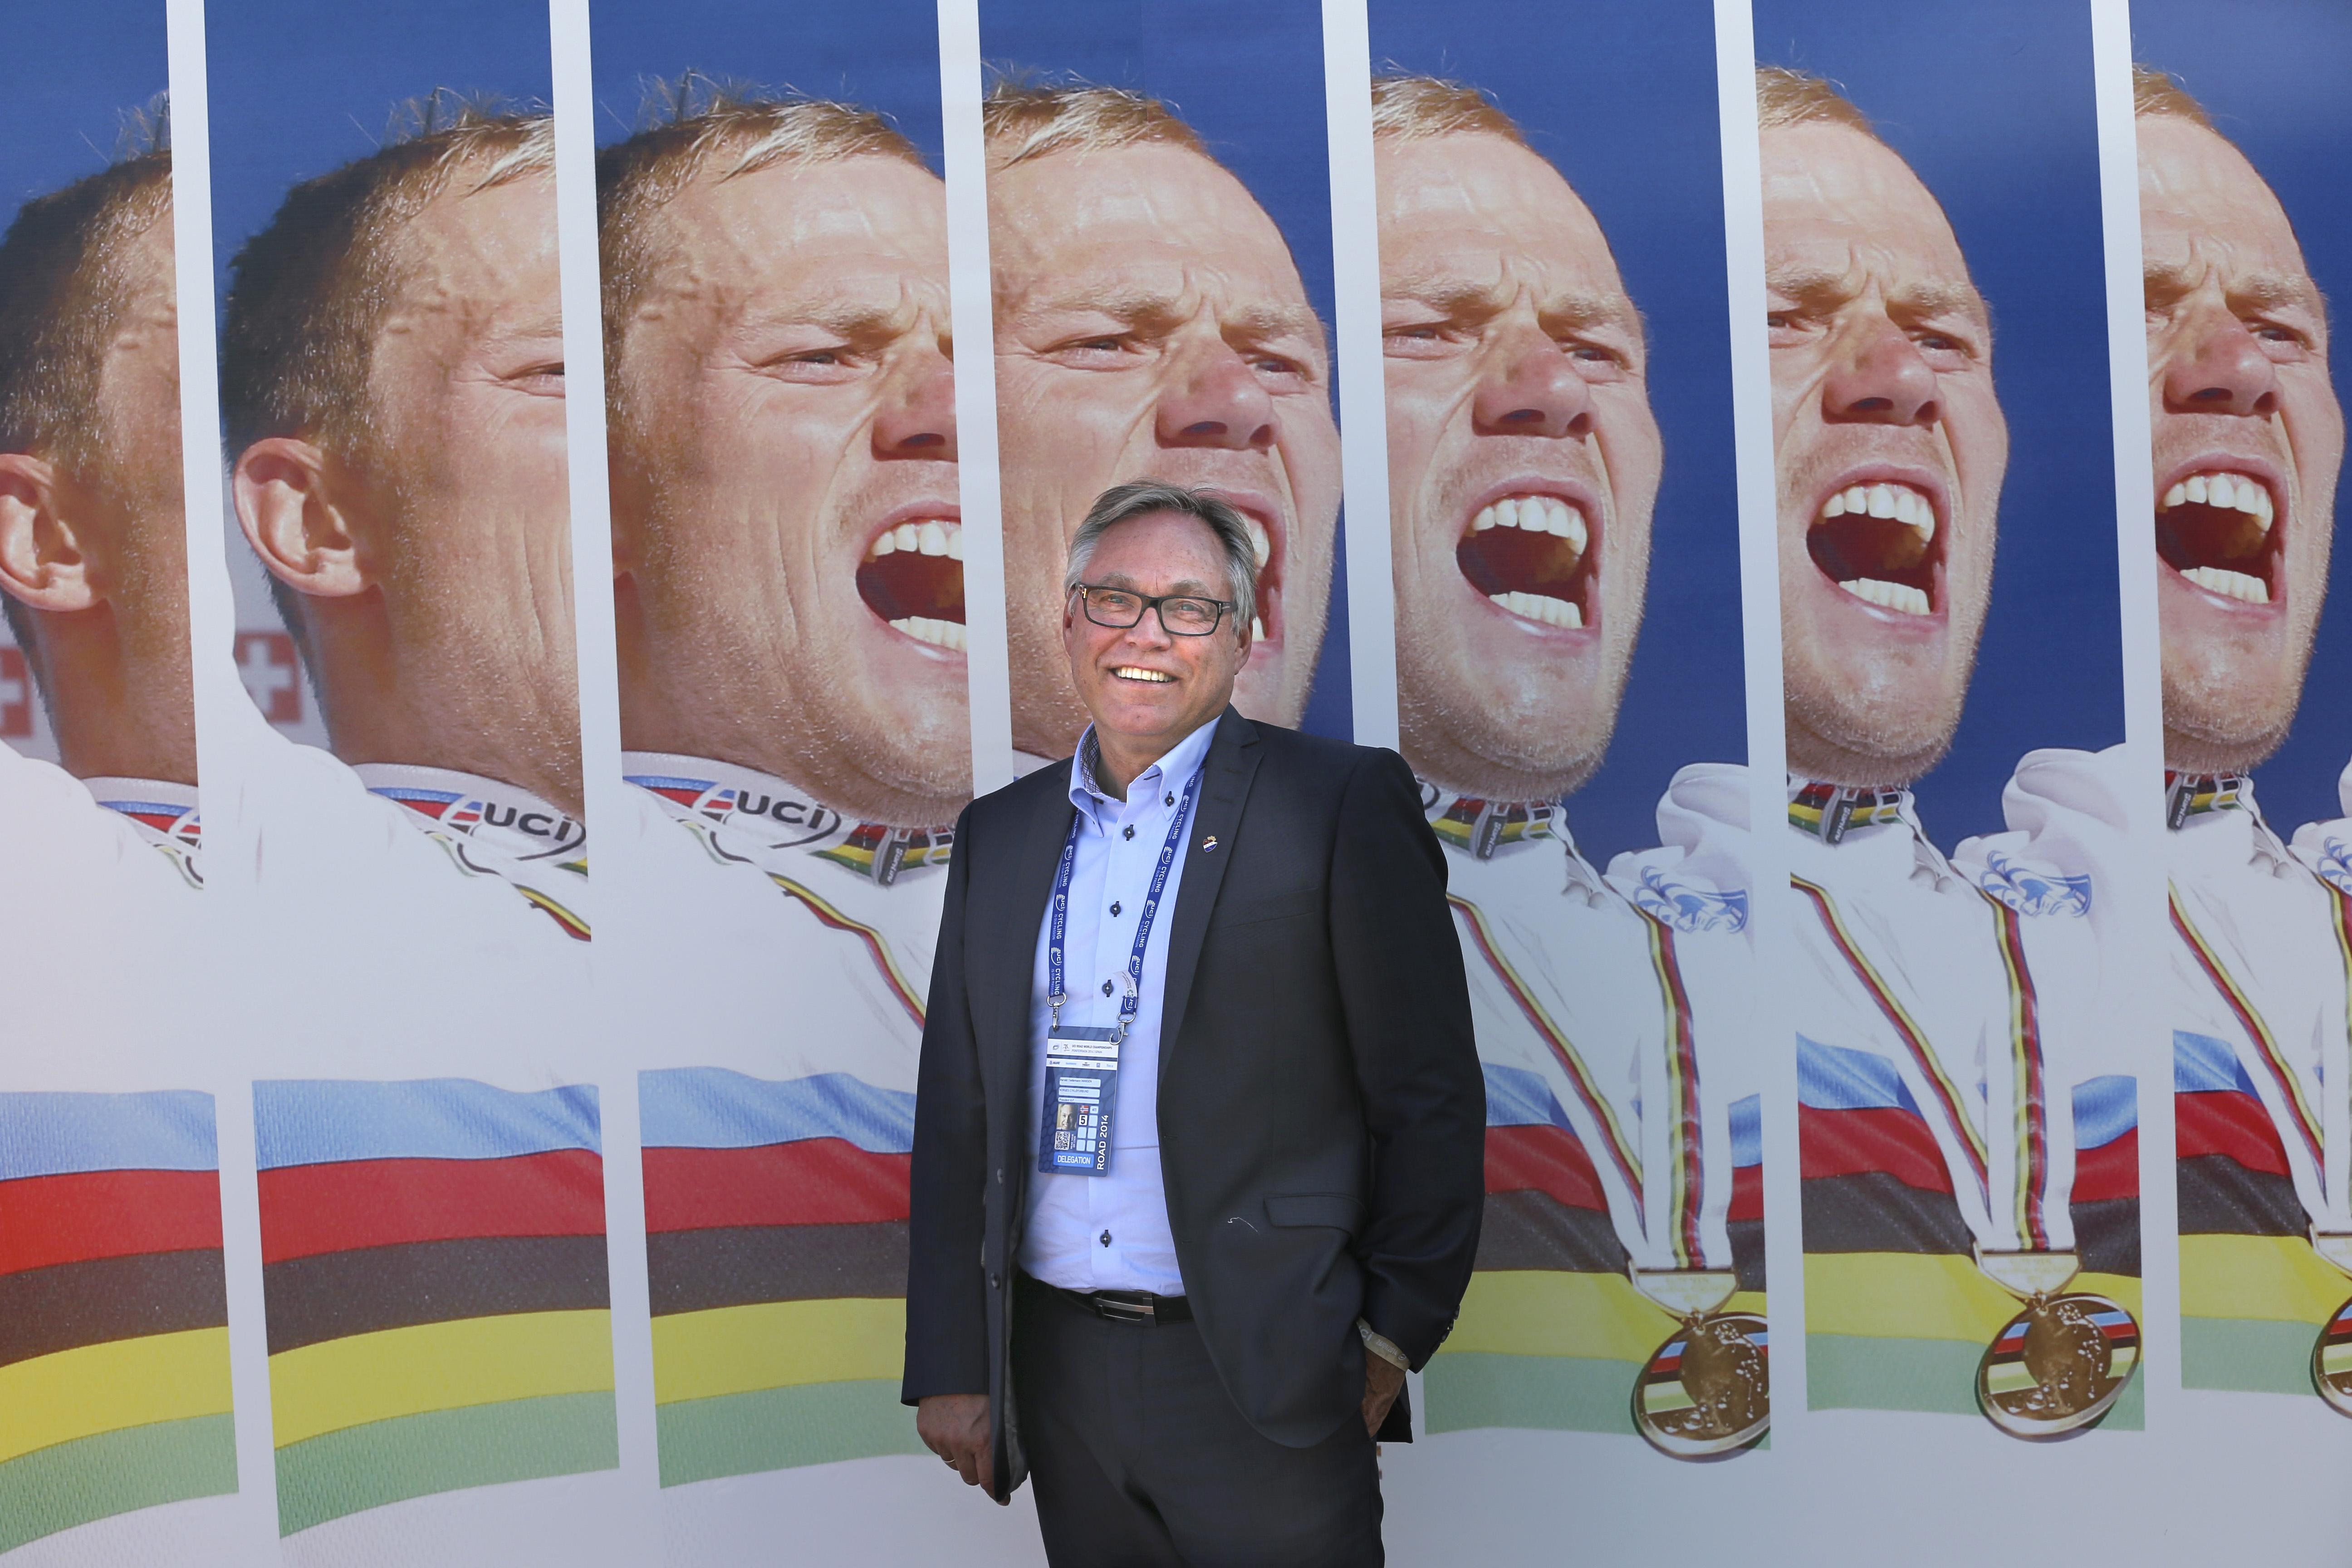 EM-ENTUSIAST: Harald Tiedemann Hansen sitter som visepresident i UEC, og hadde nok håpet å se norske sykkelproffer under EM i Plumelec. Foto: Vidar Ruud / NTB scanpix